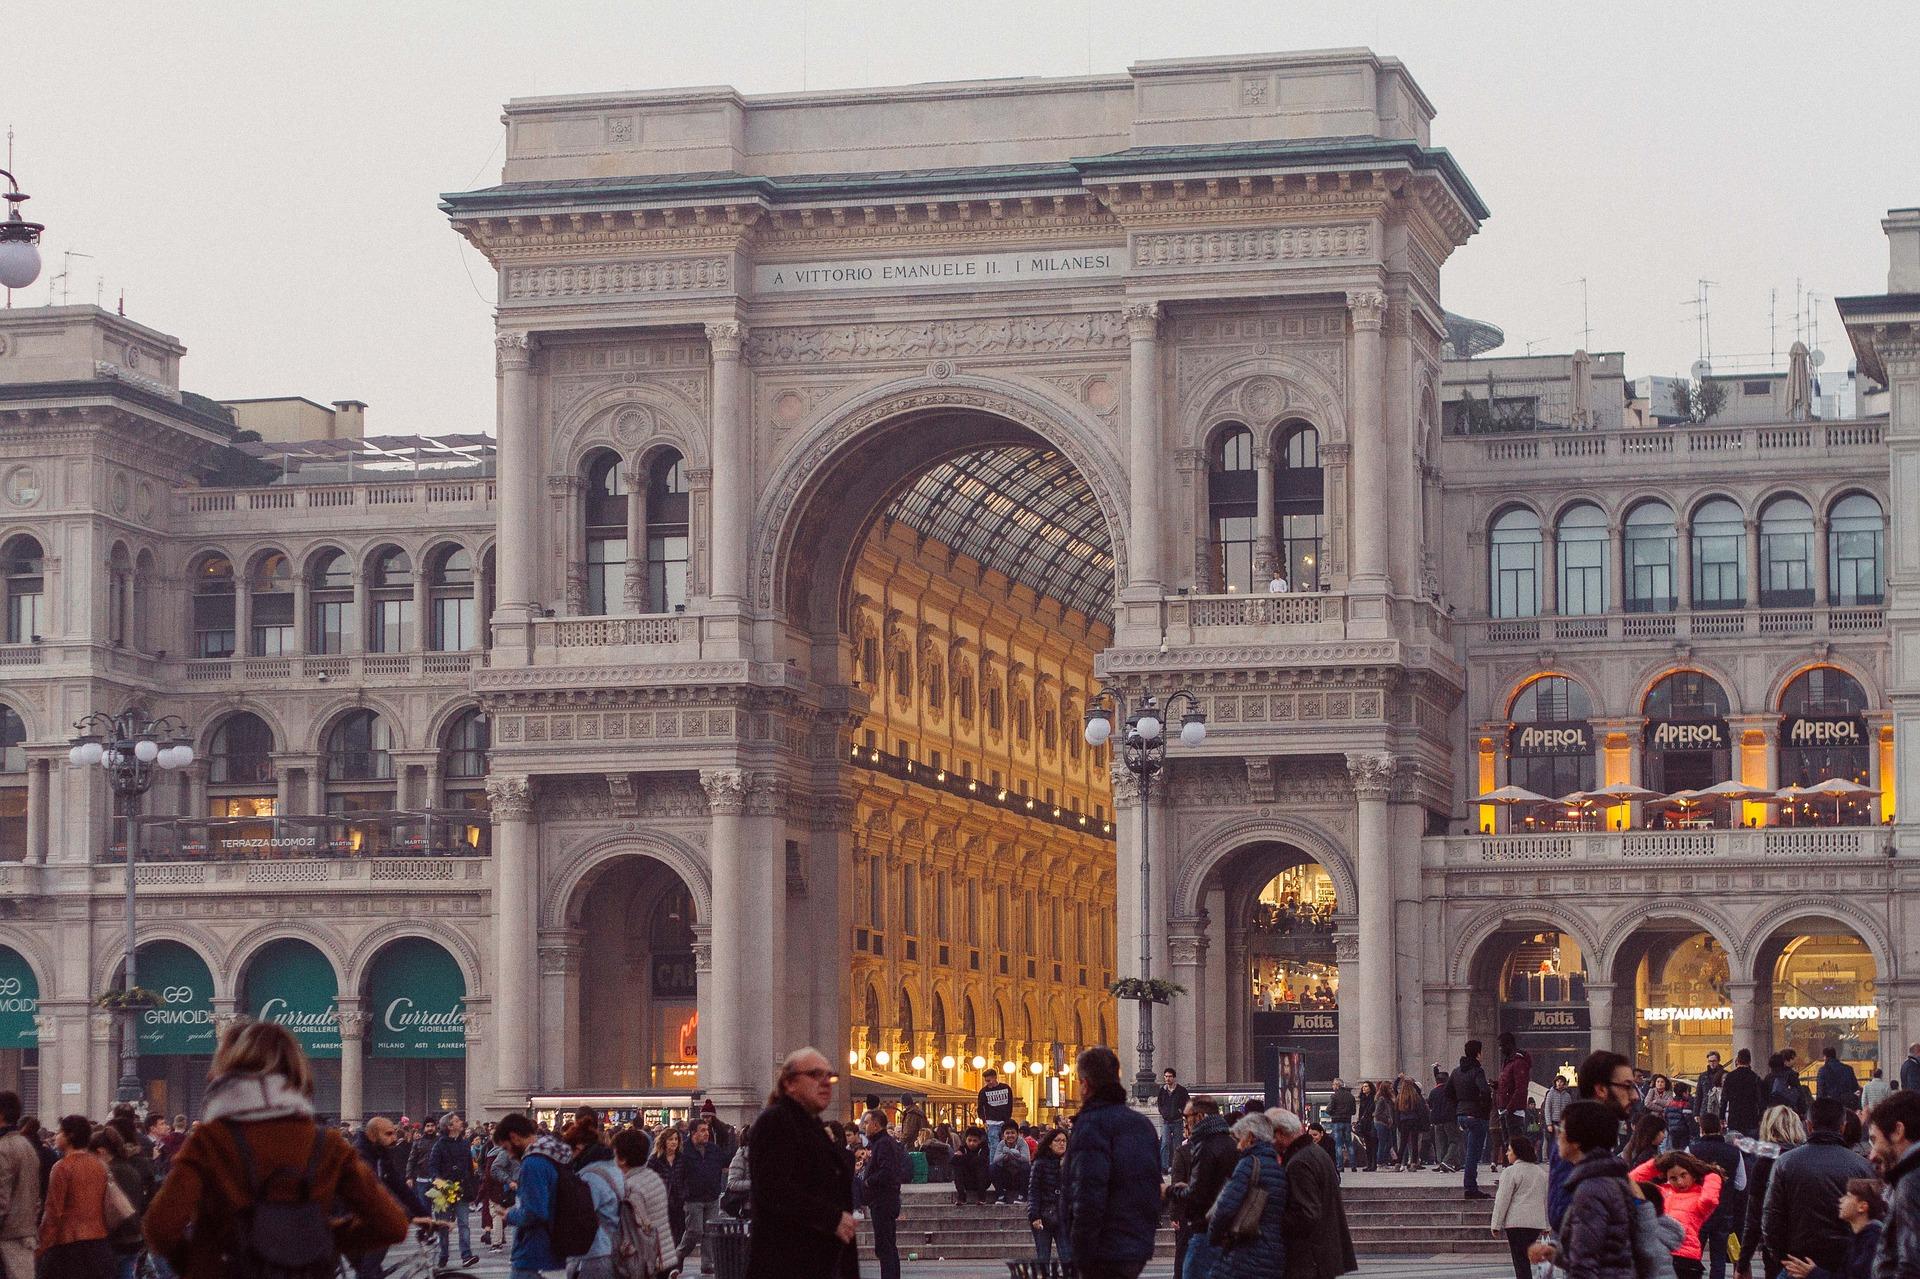 Galleria Vittorio Emanuele im Zentrum der Stadt